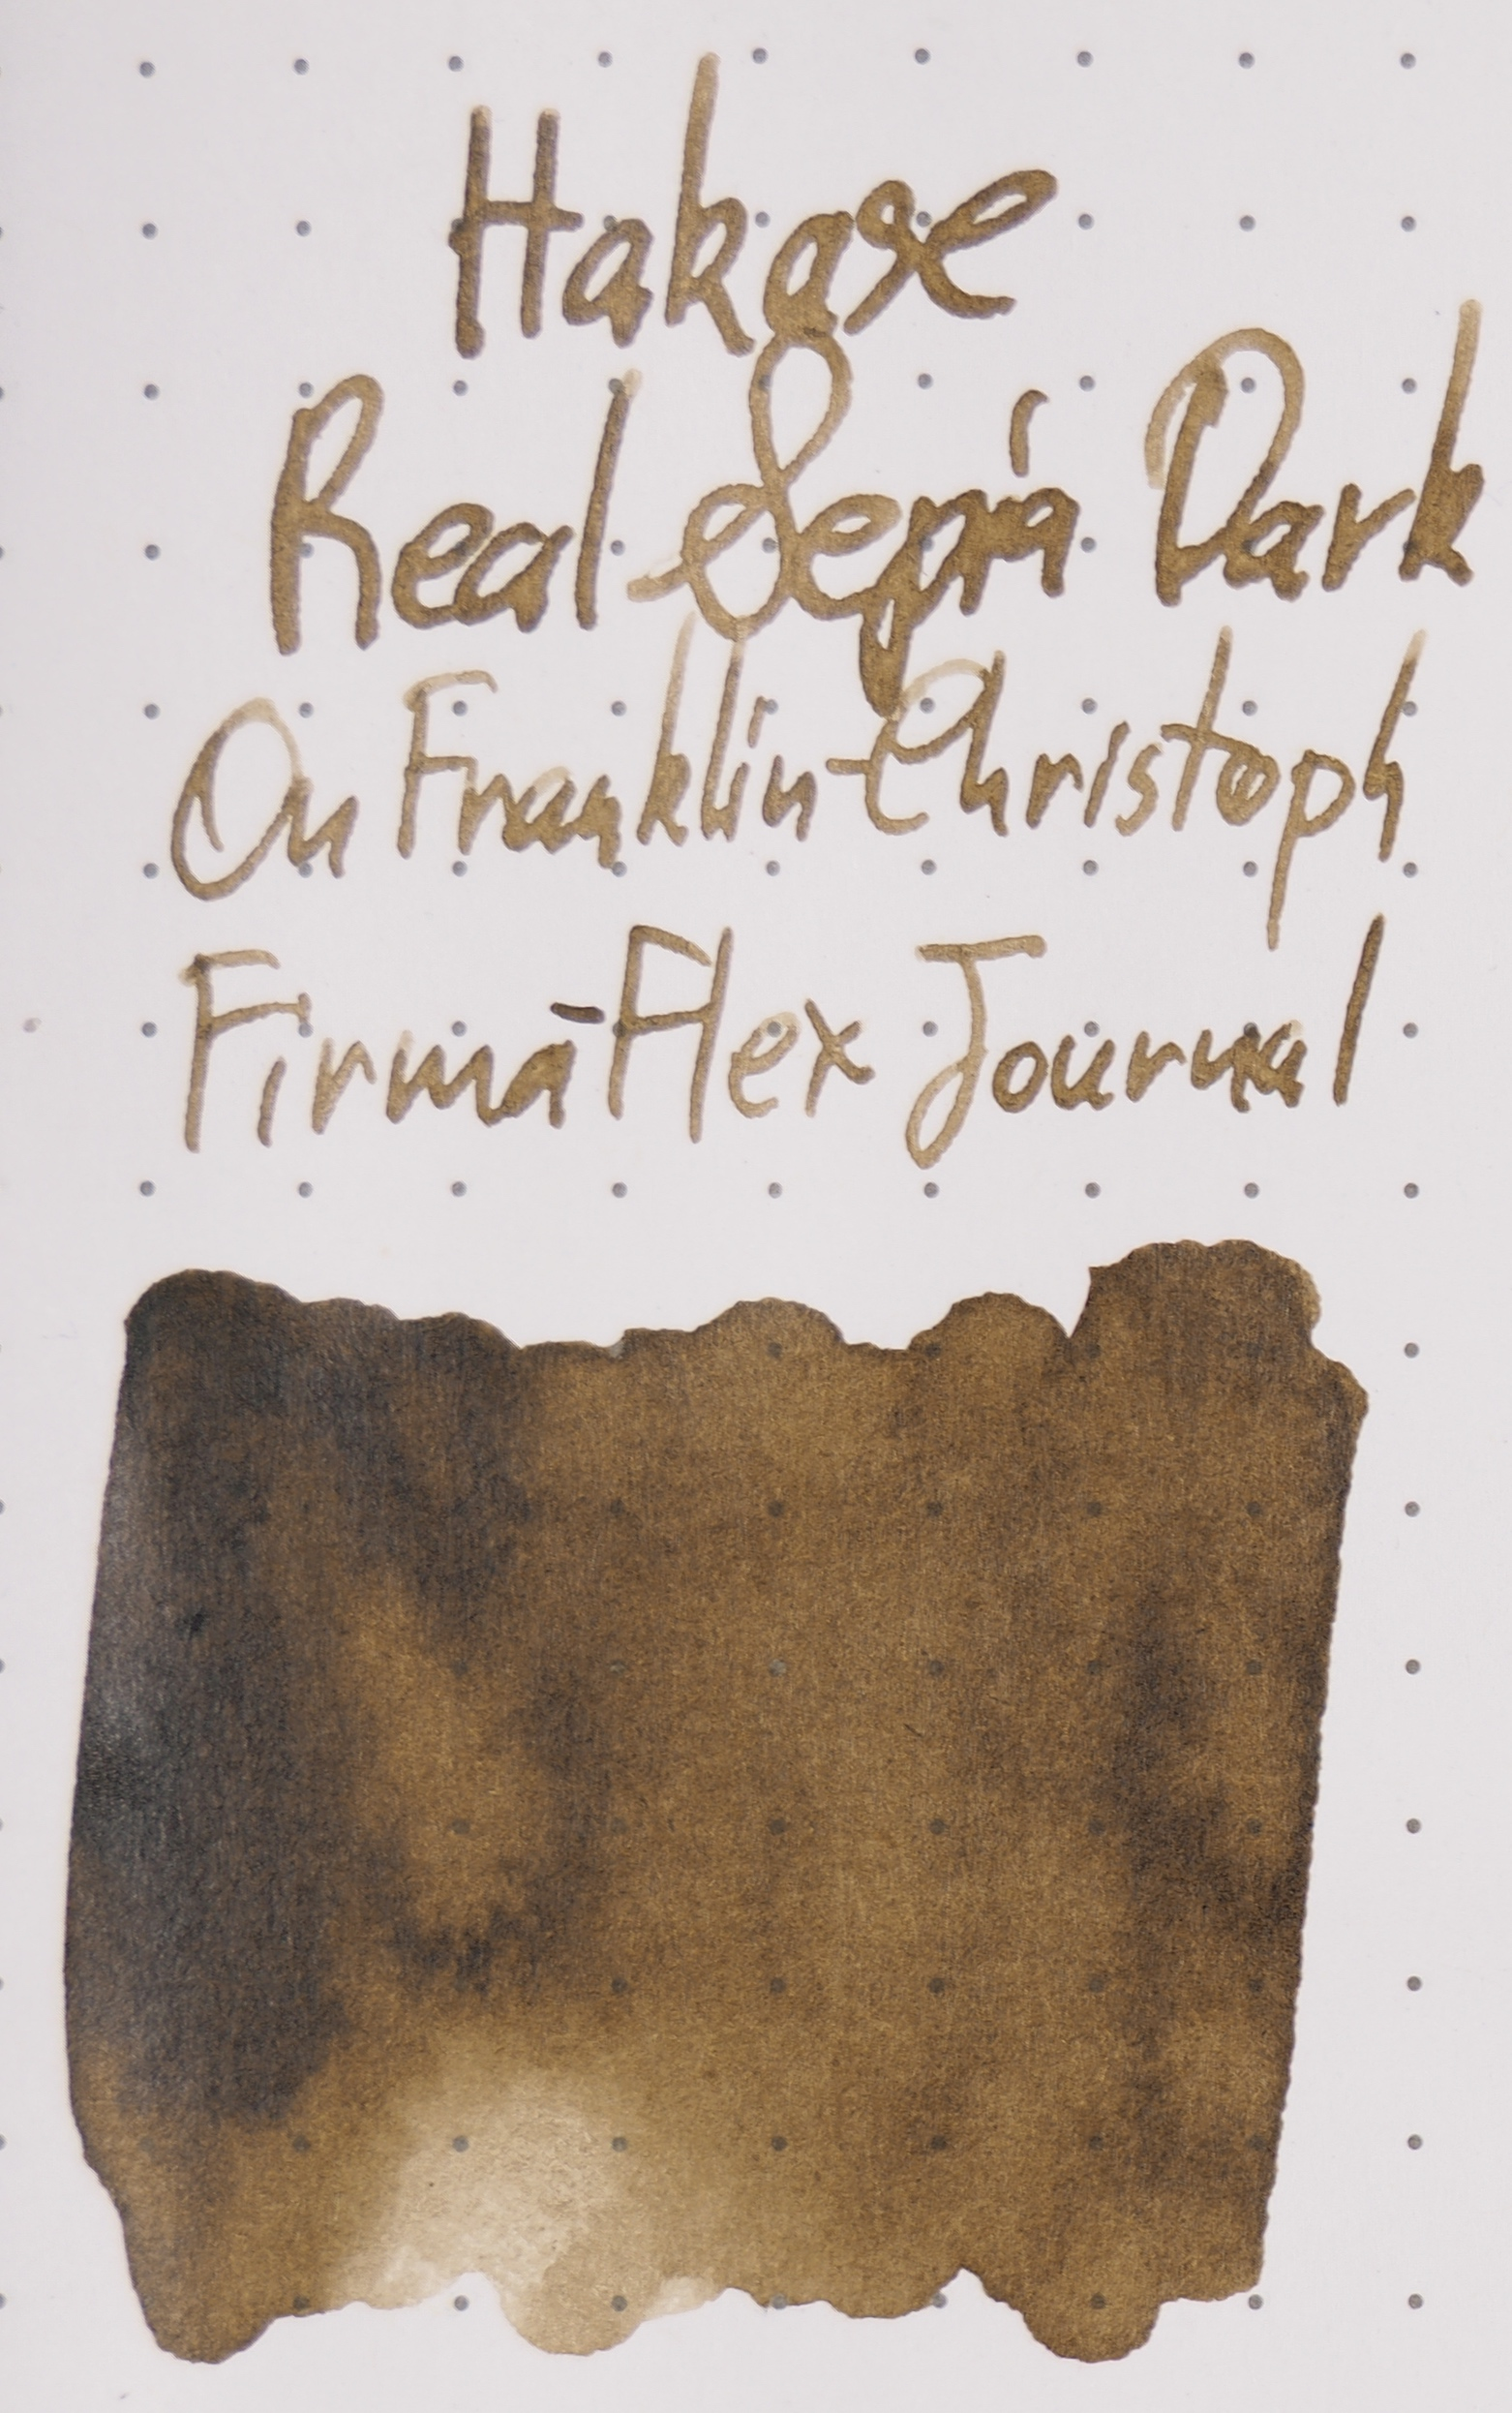 Franklin-Christoph Firma-Flex